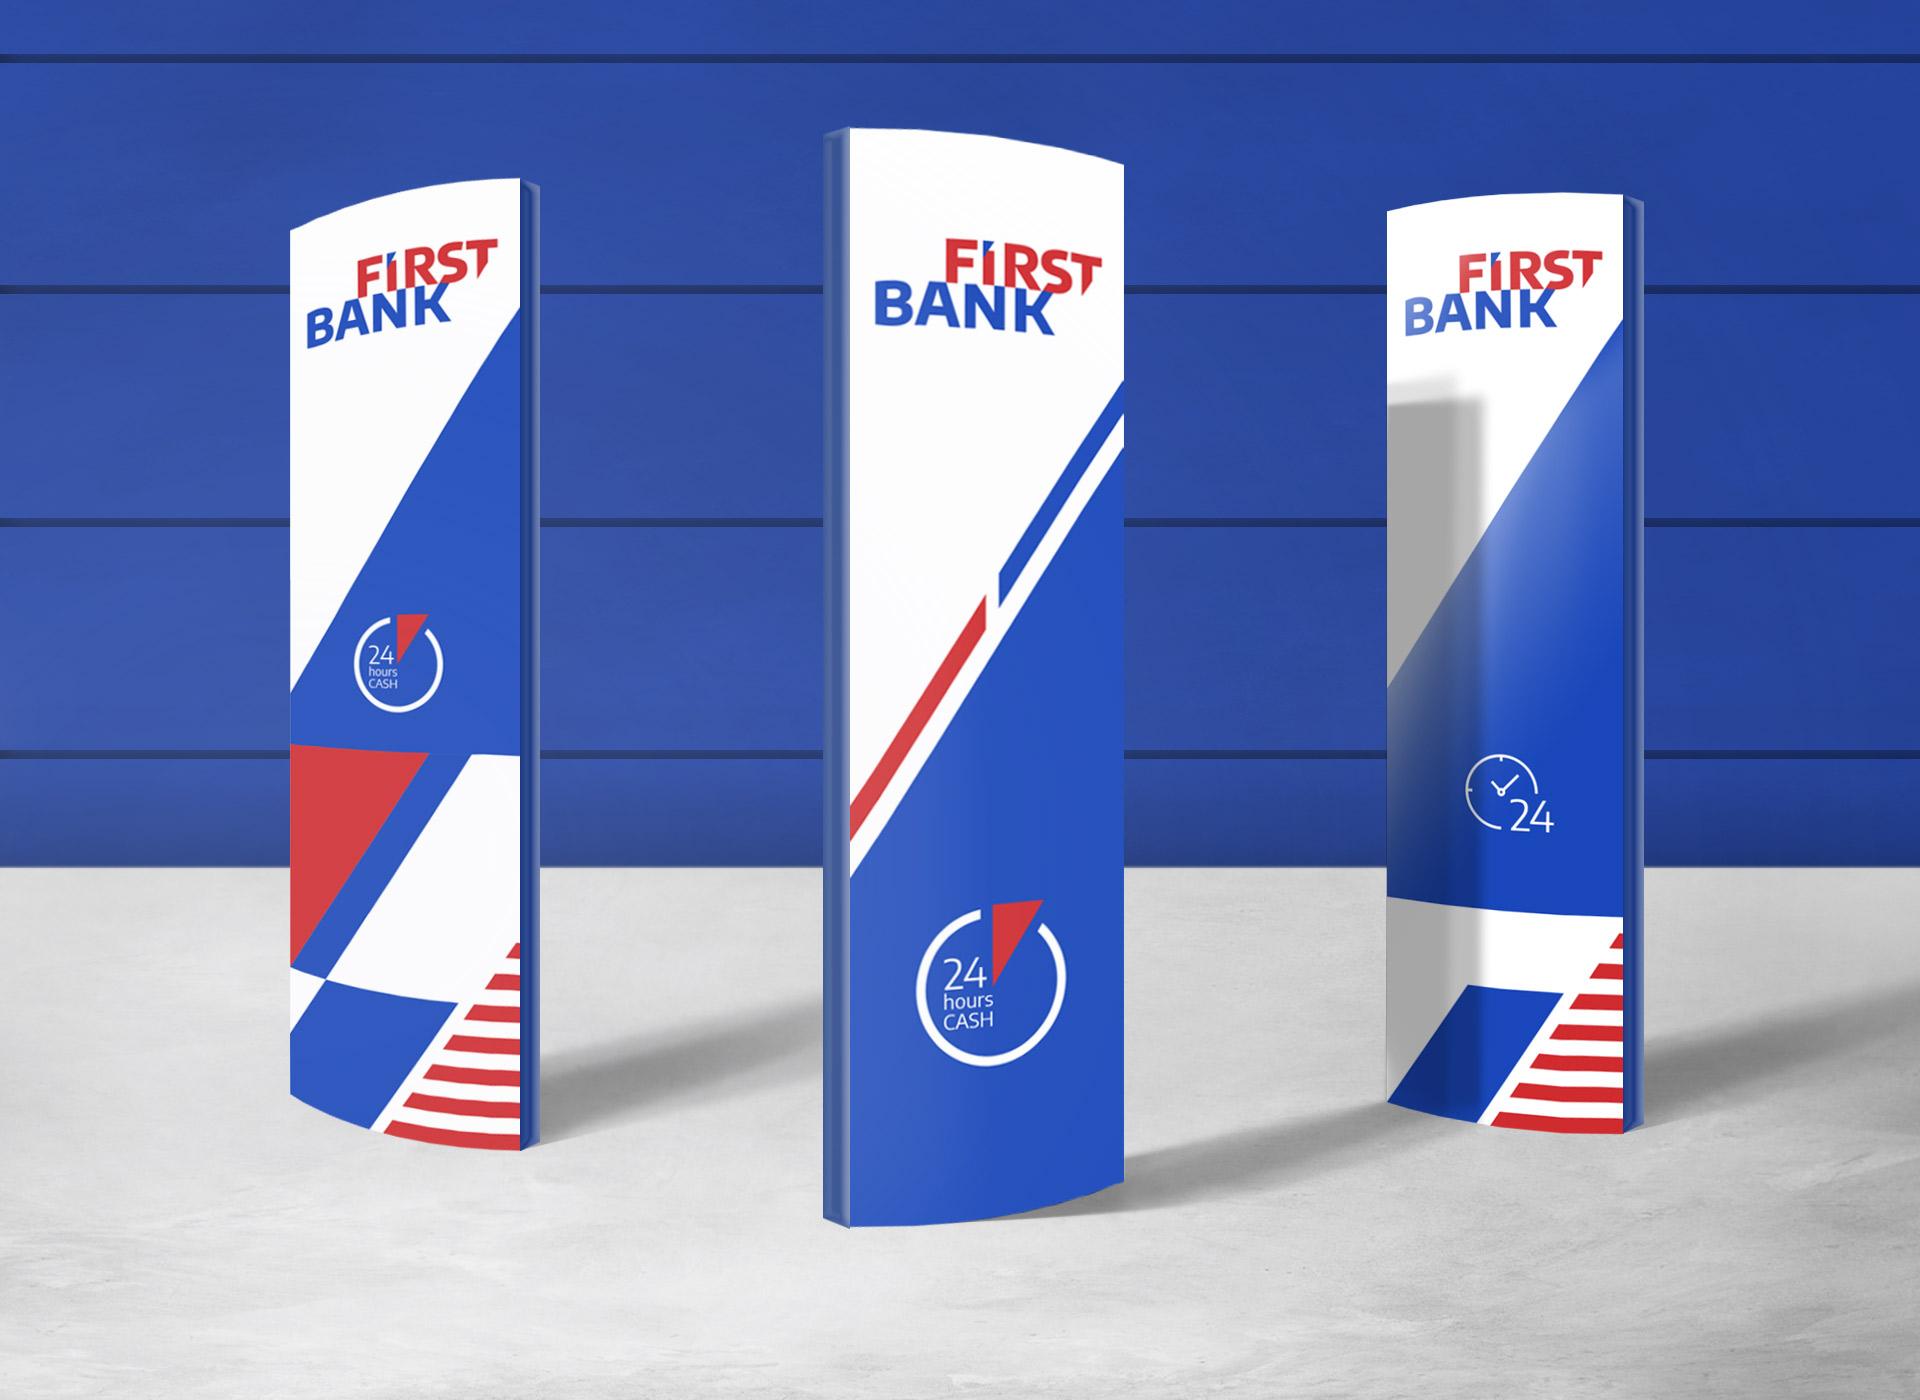 first bank portofoliu inoveo fatada istorice